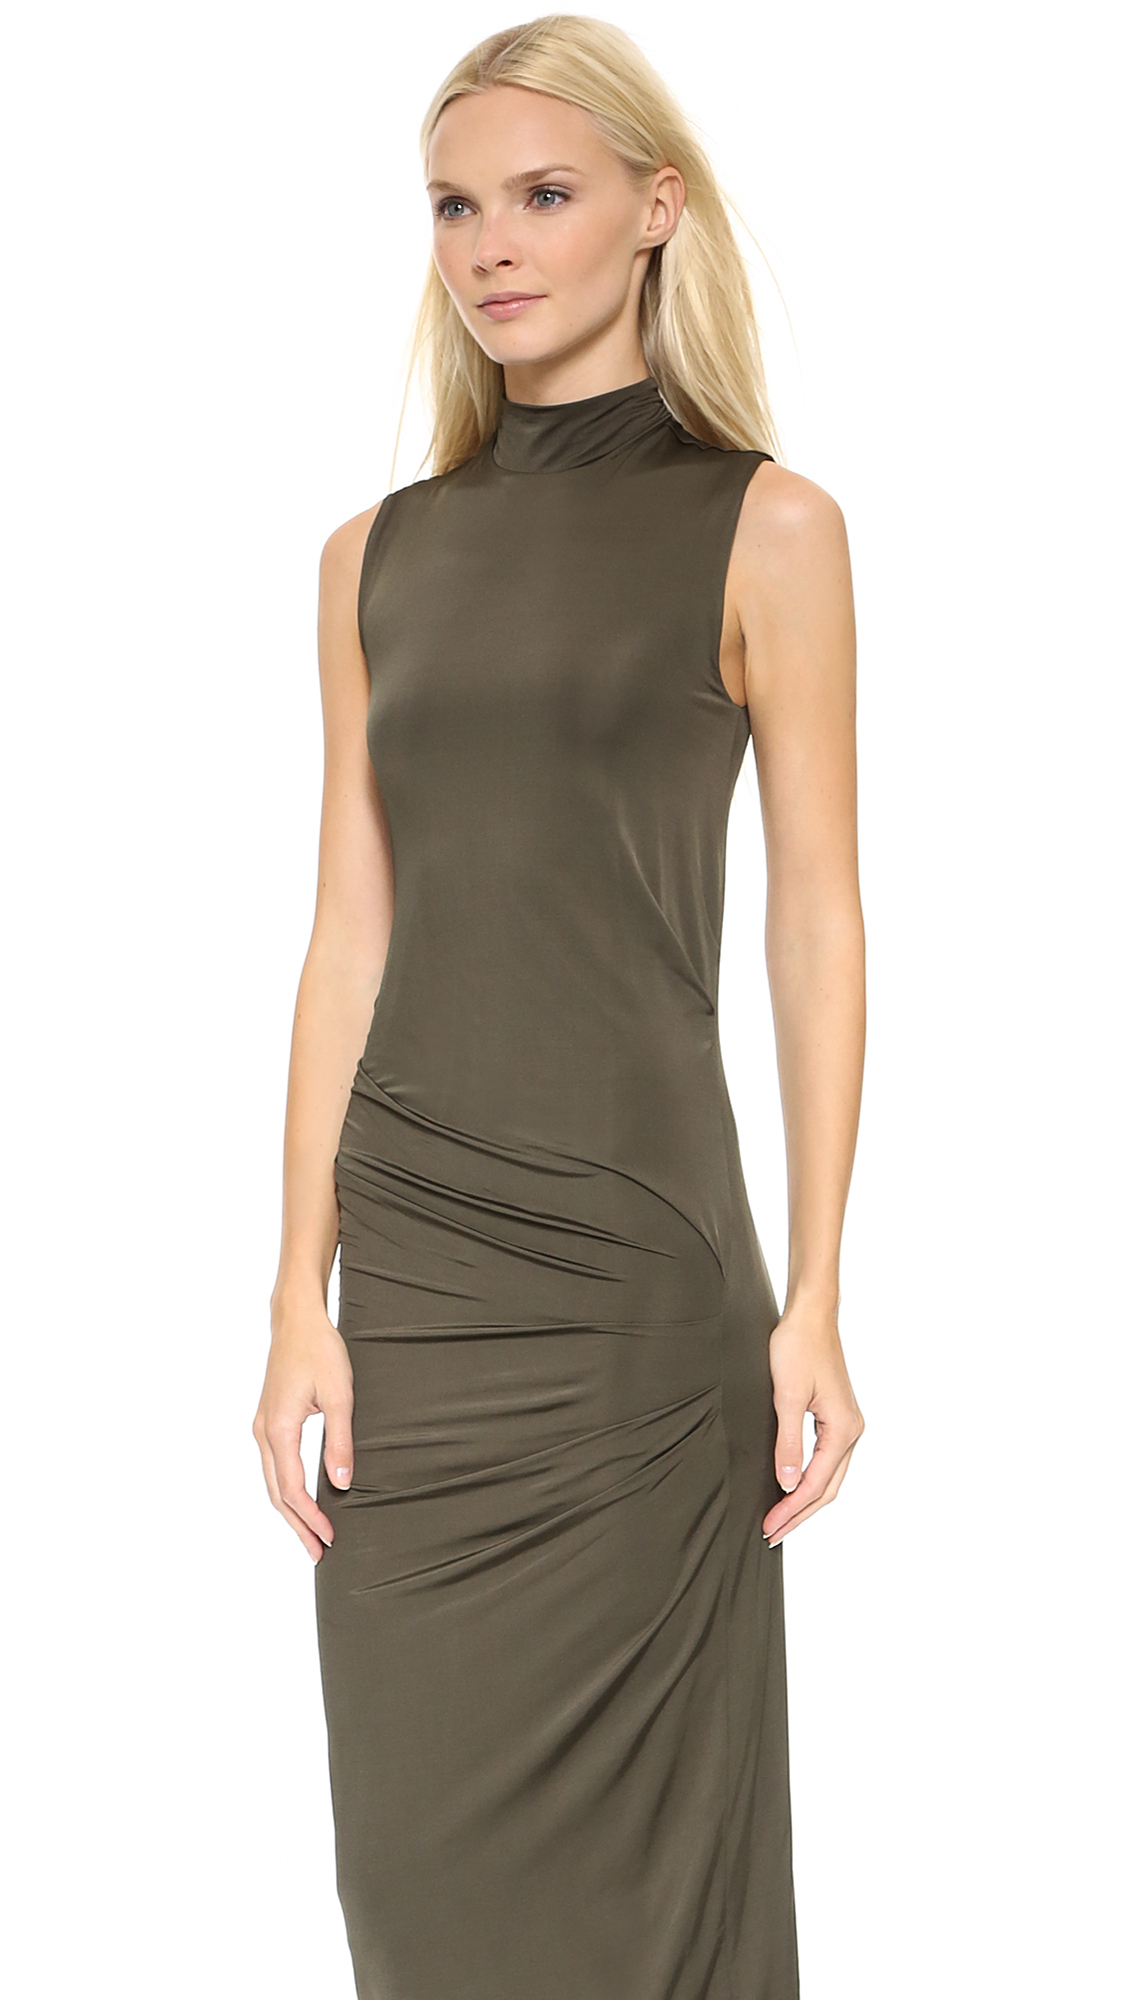 Dark Olive Green Plaid Check Collared Shirt Plus Shift mv Dress 1XL 2XL 3XL $ Show On Ebay Check Plaid Floral Asymmetric Ruffle Garden Party mv Dress S M L 1XL 2XL 3XL.